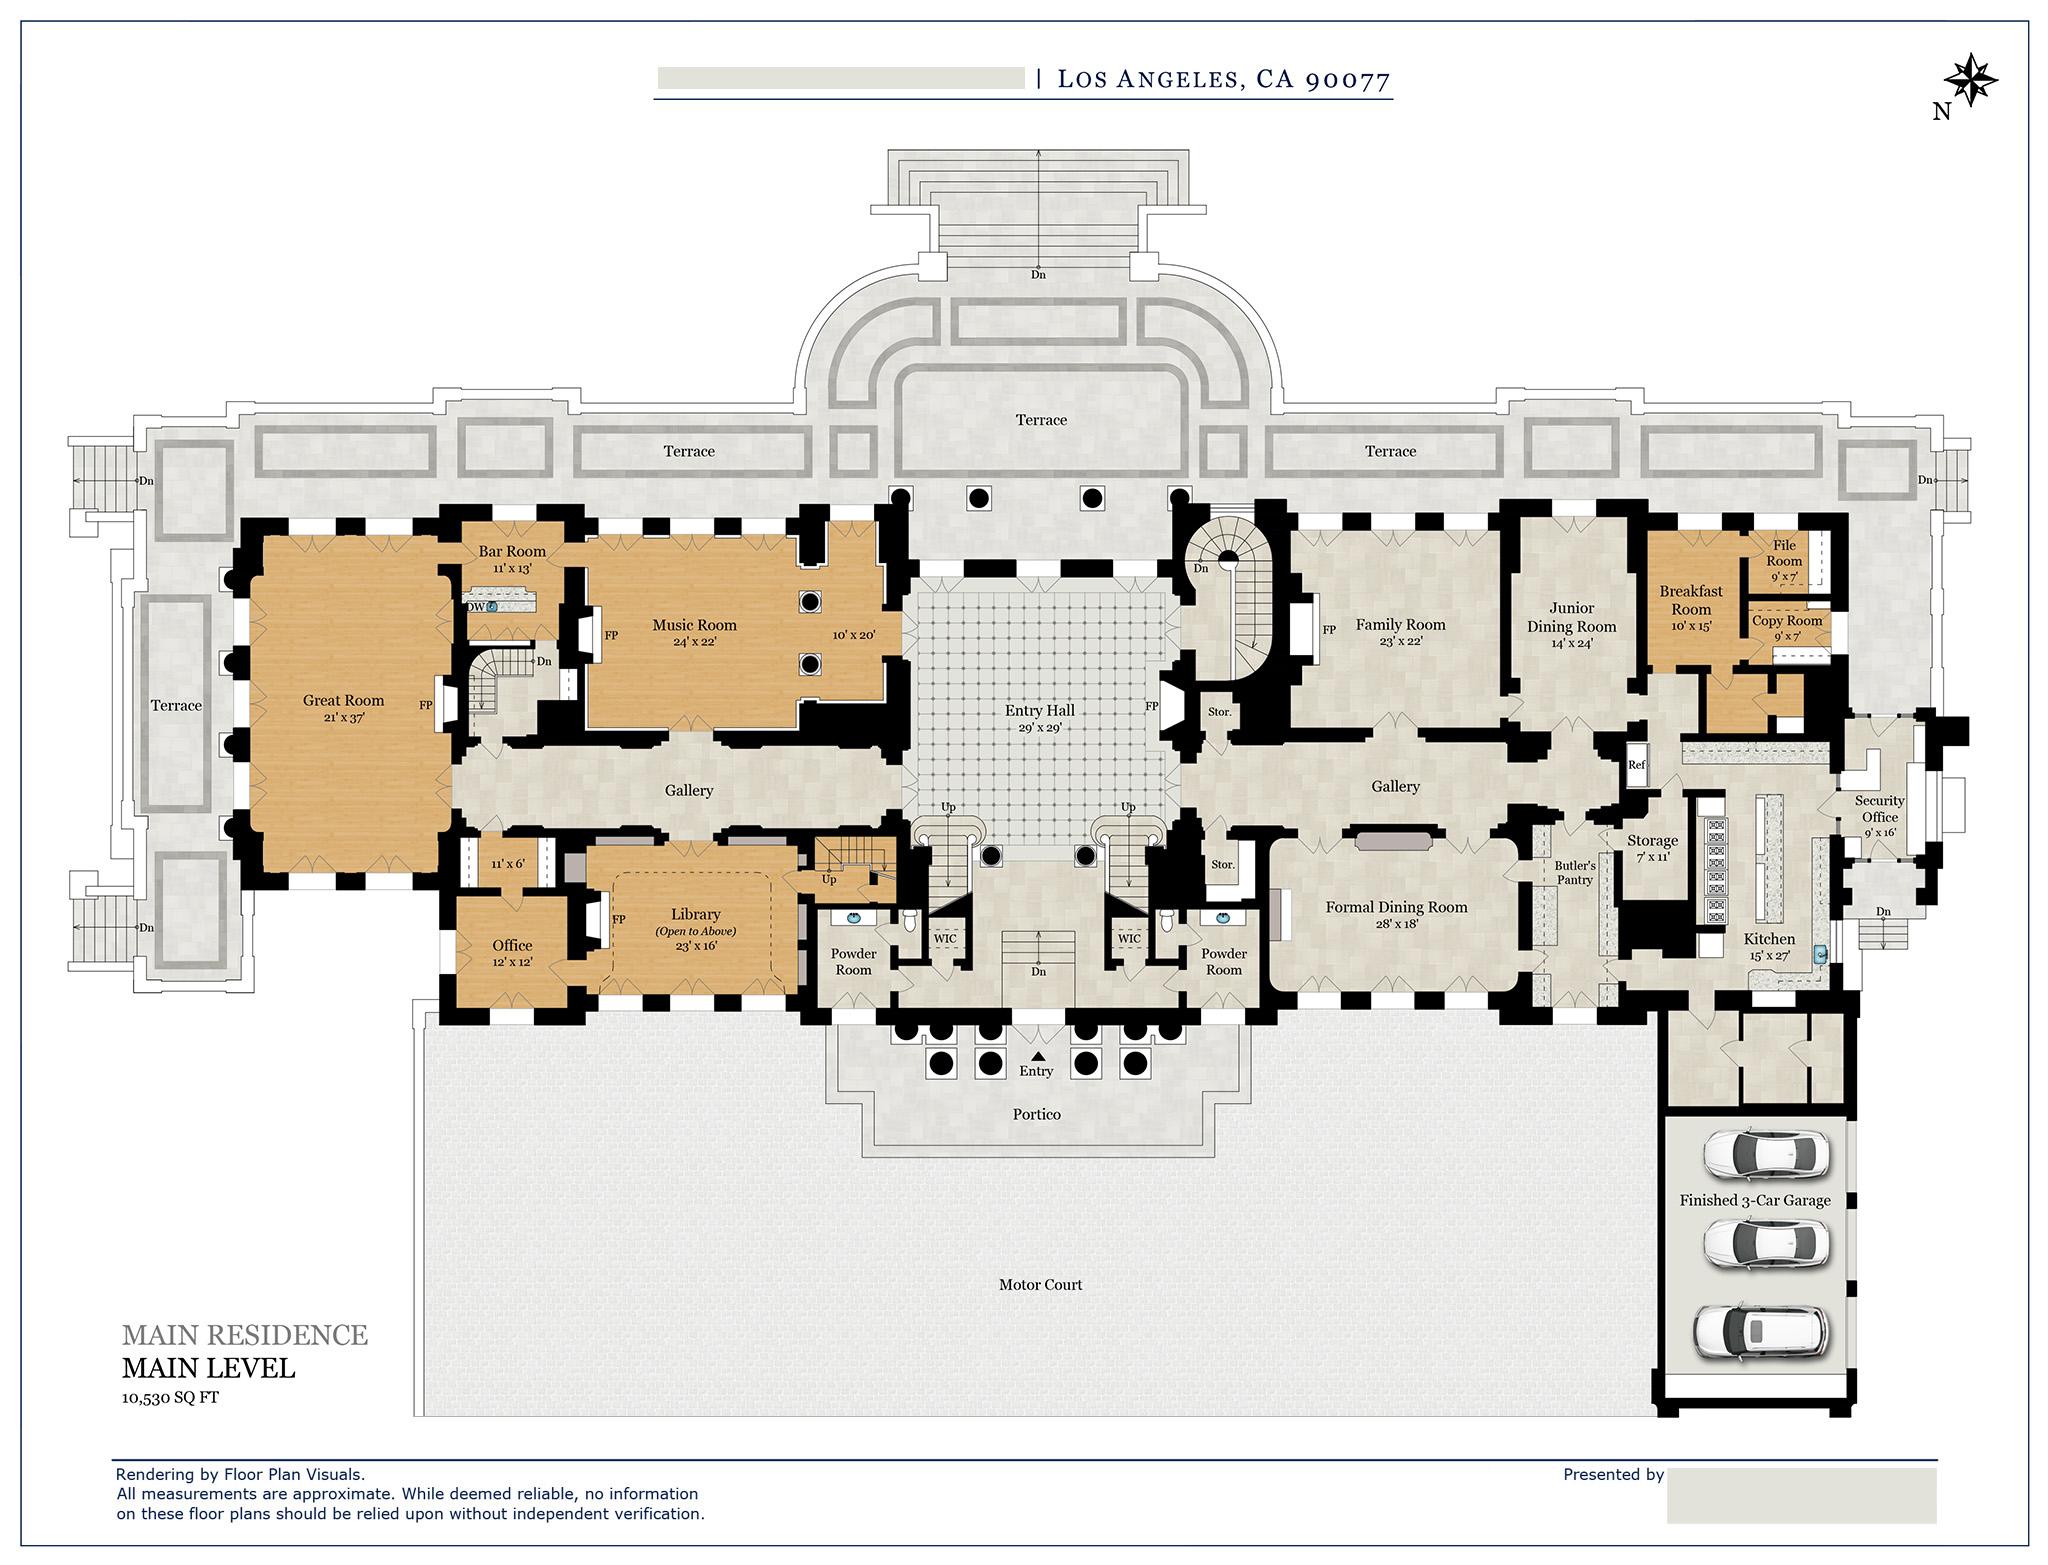 Residential Floor Plans Gallery Floor Plan Visuals